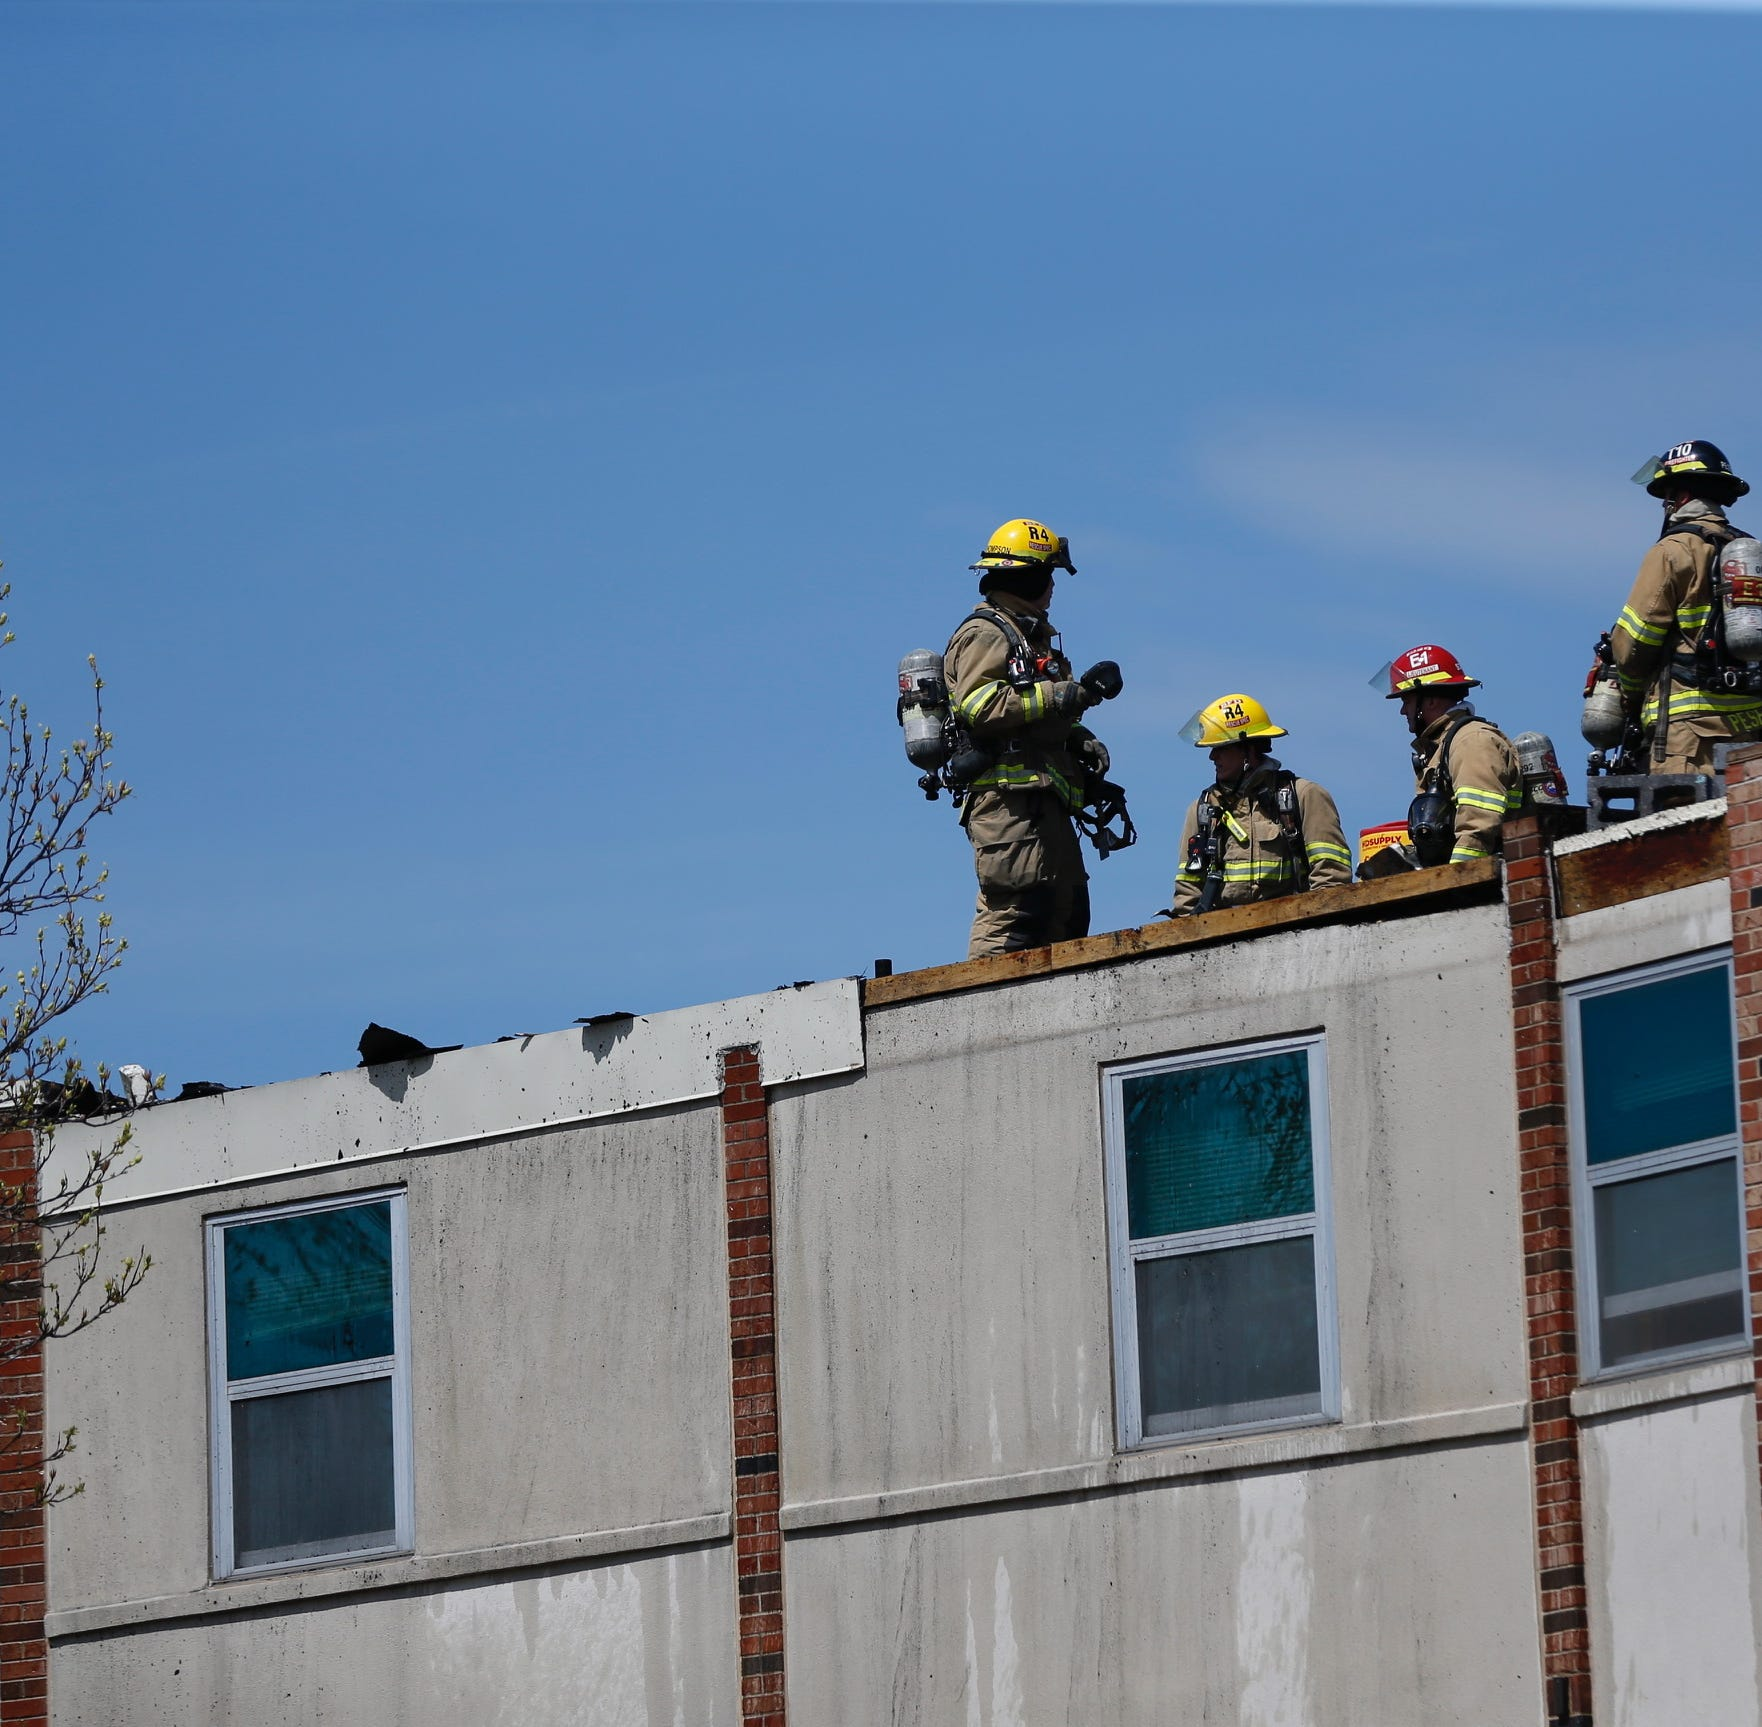 Fire causes evacuation of Evangel dormitory